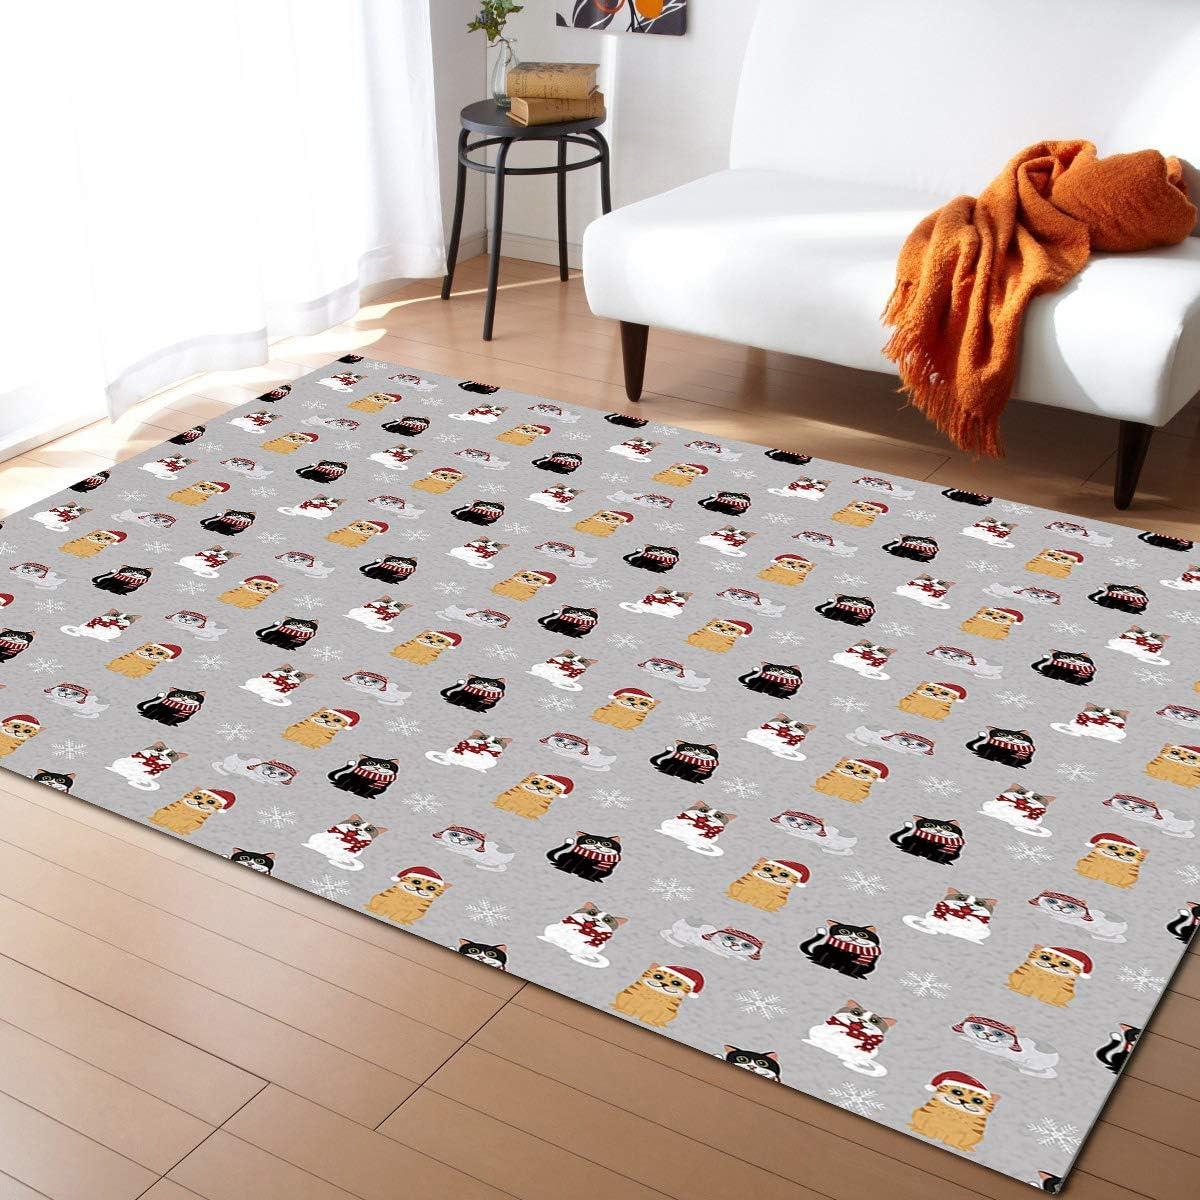 ARTSHOWING Max 64% OFF Merry Luxury goods Christmas Area Non-Slip Decorative Carpets Rug